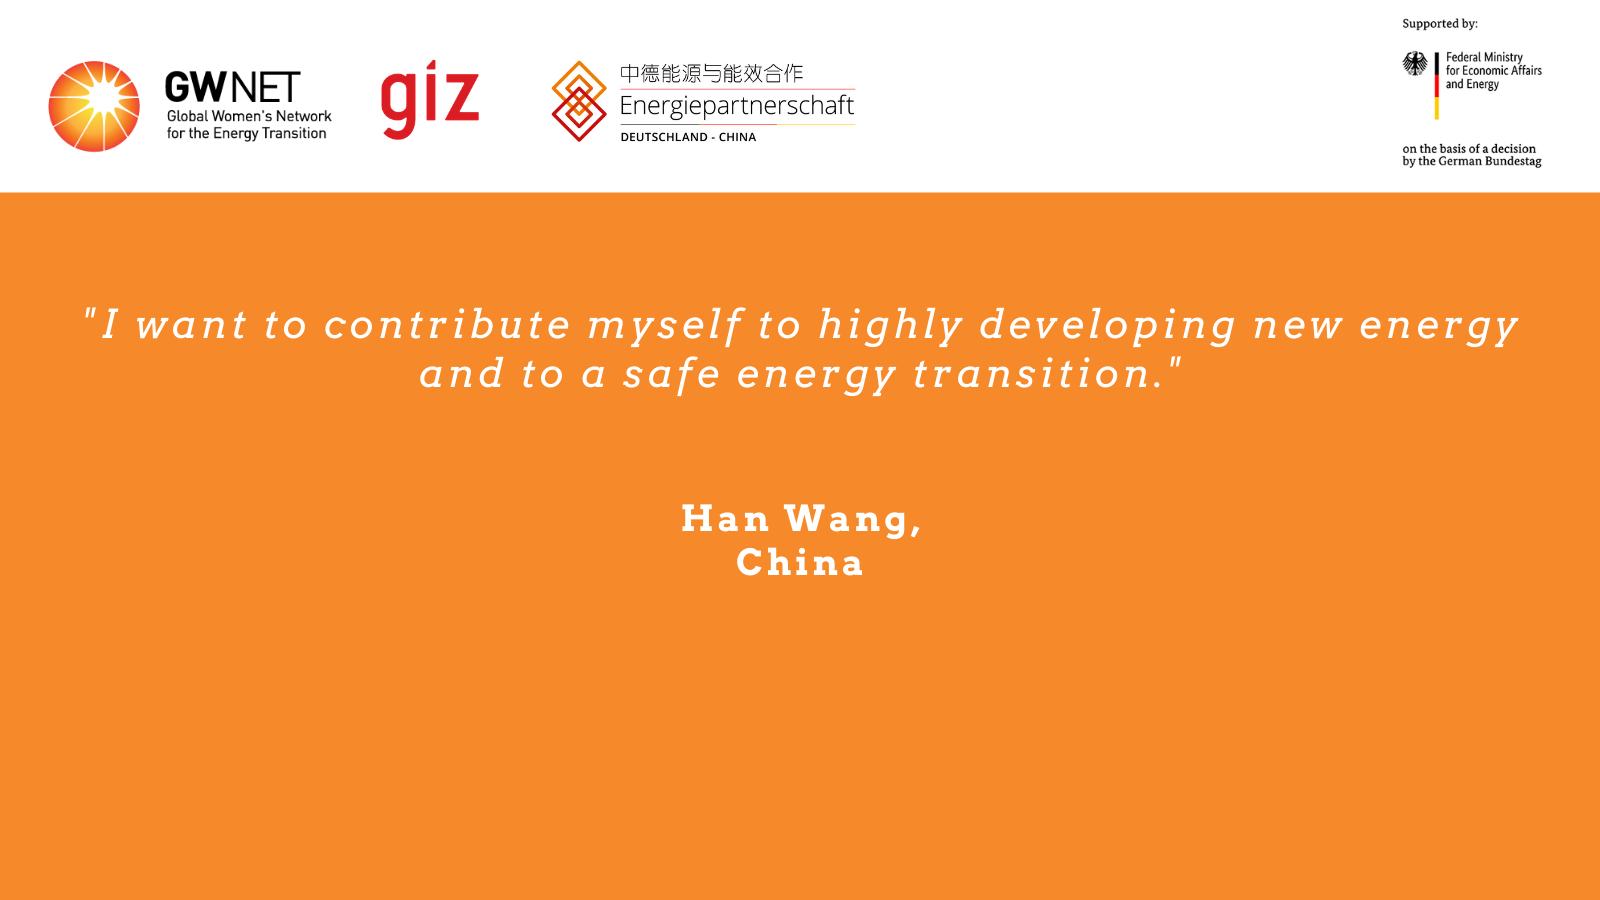 Han Wang quote